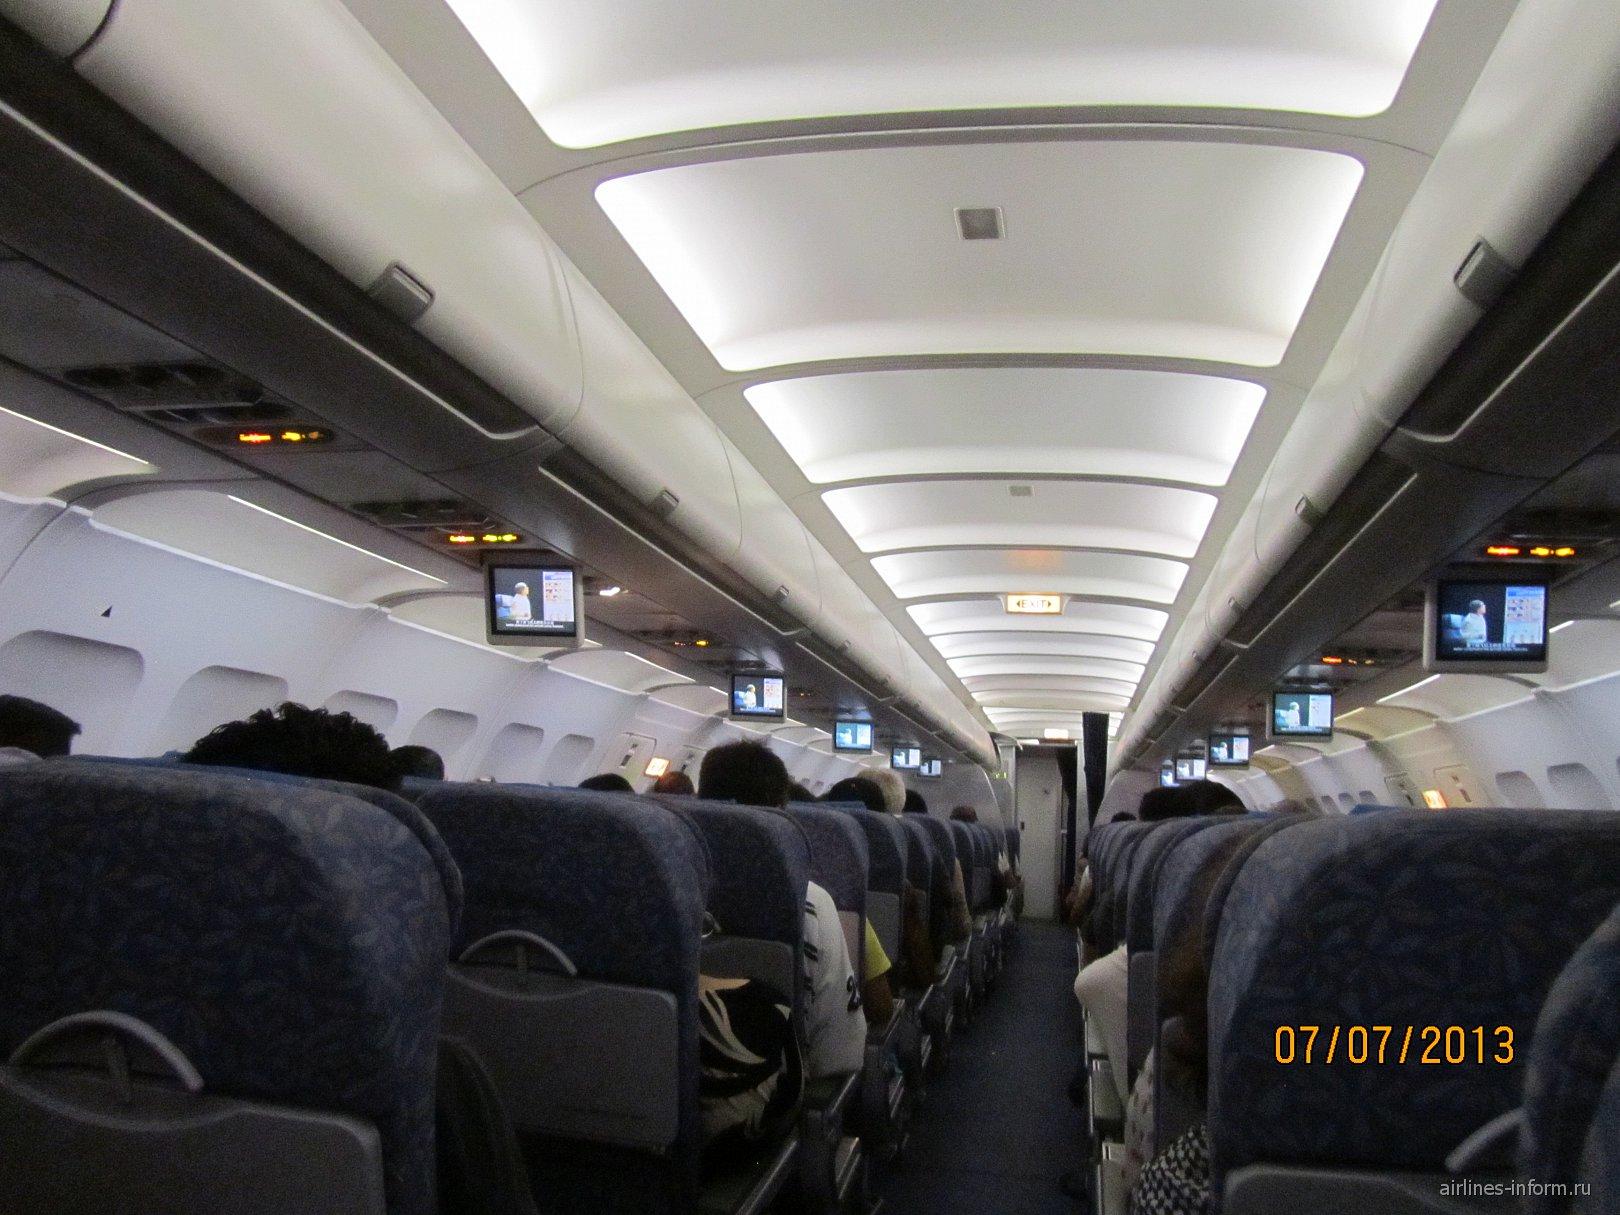 Салон самолета Эрбас А-320 Филиппинских авиалиний